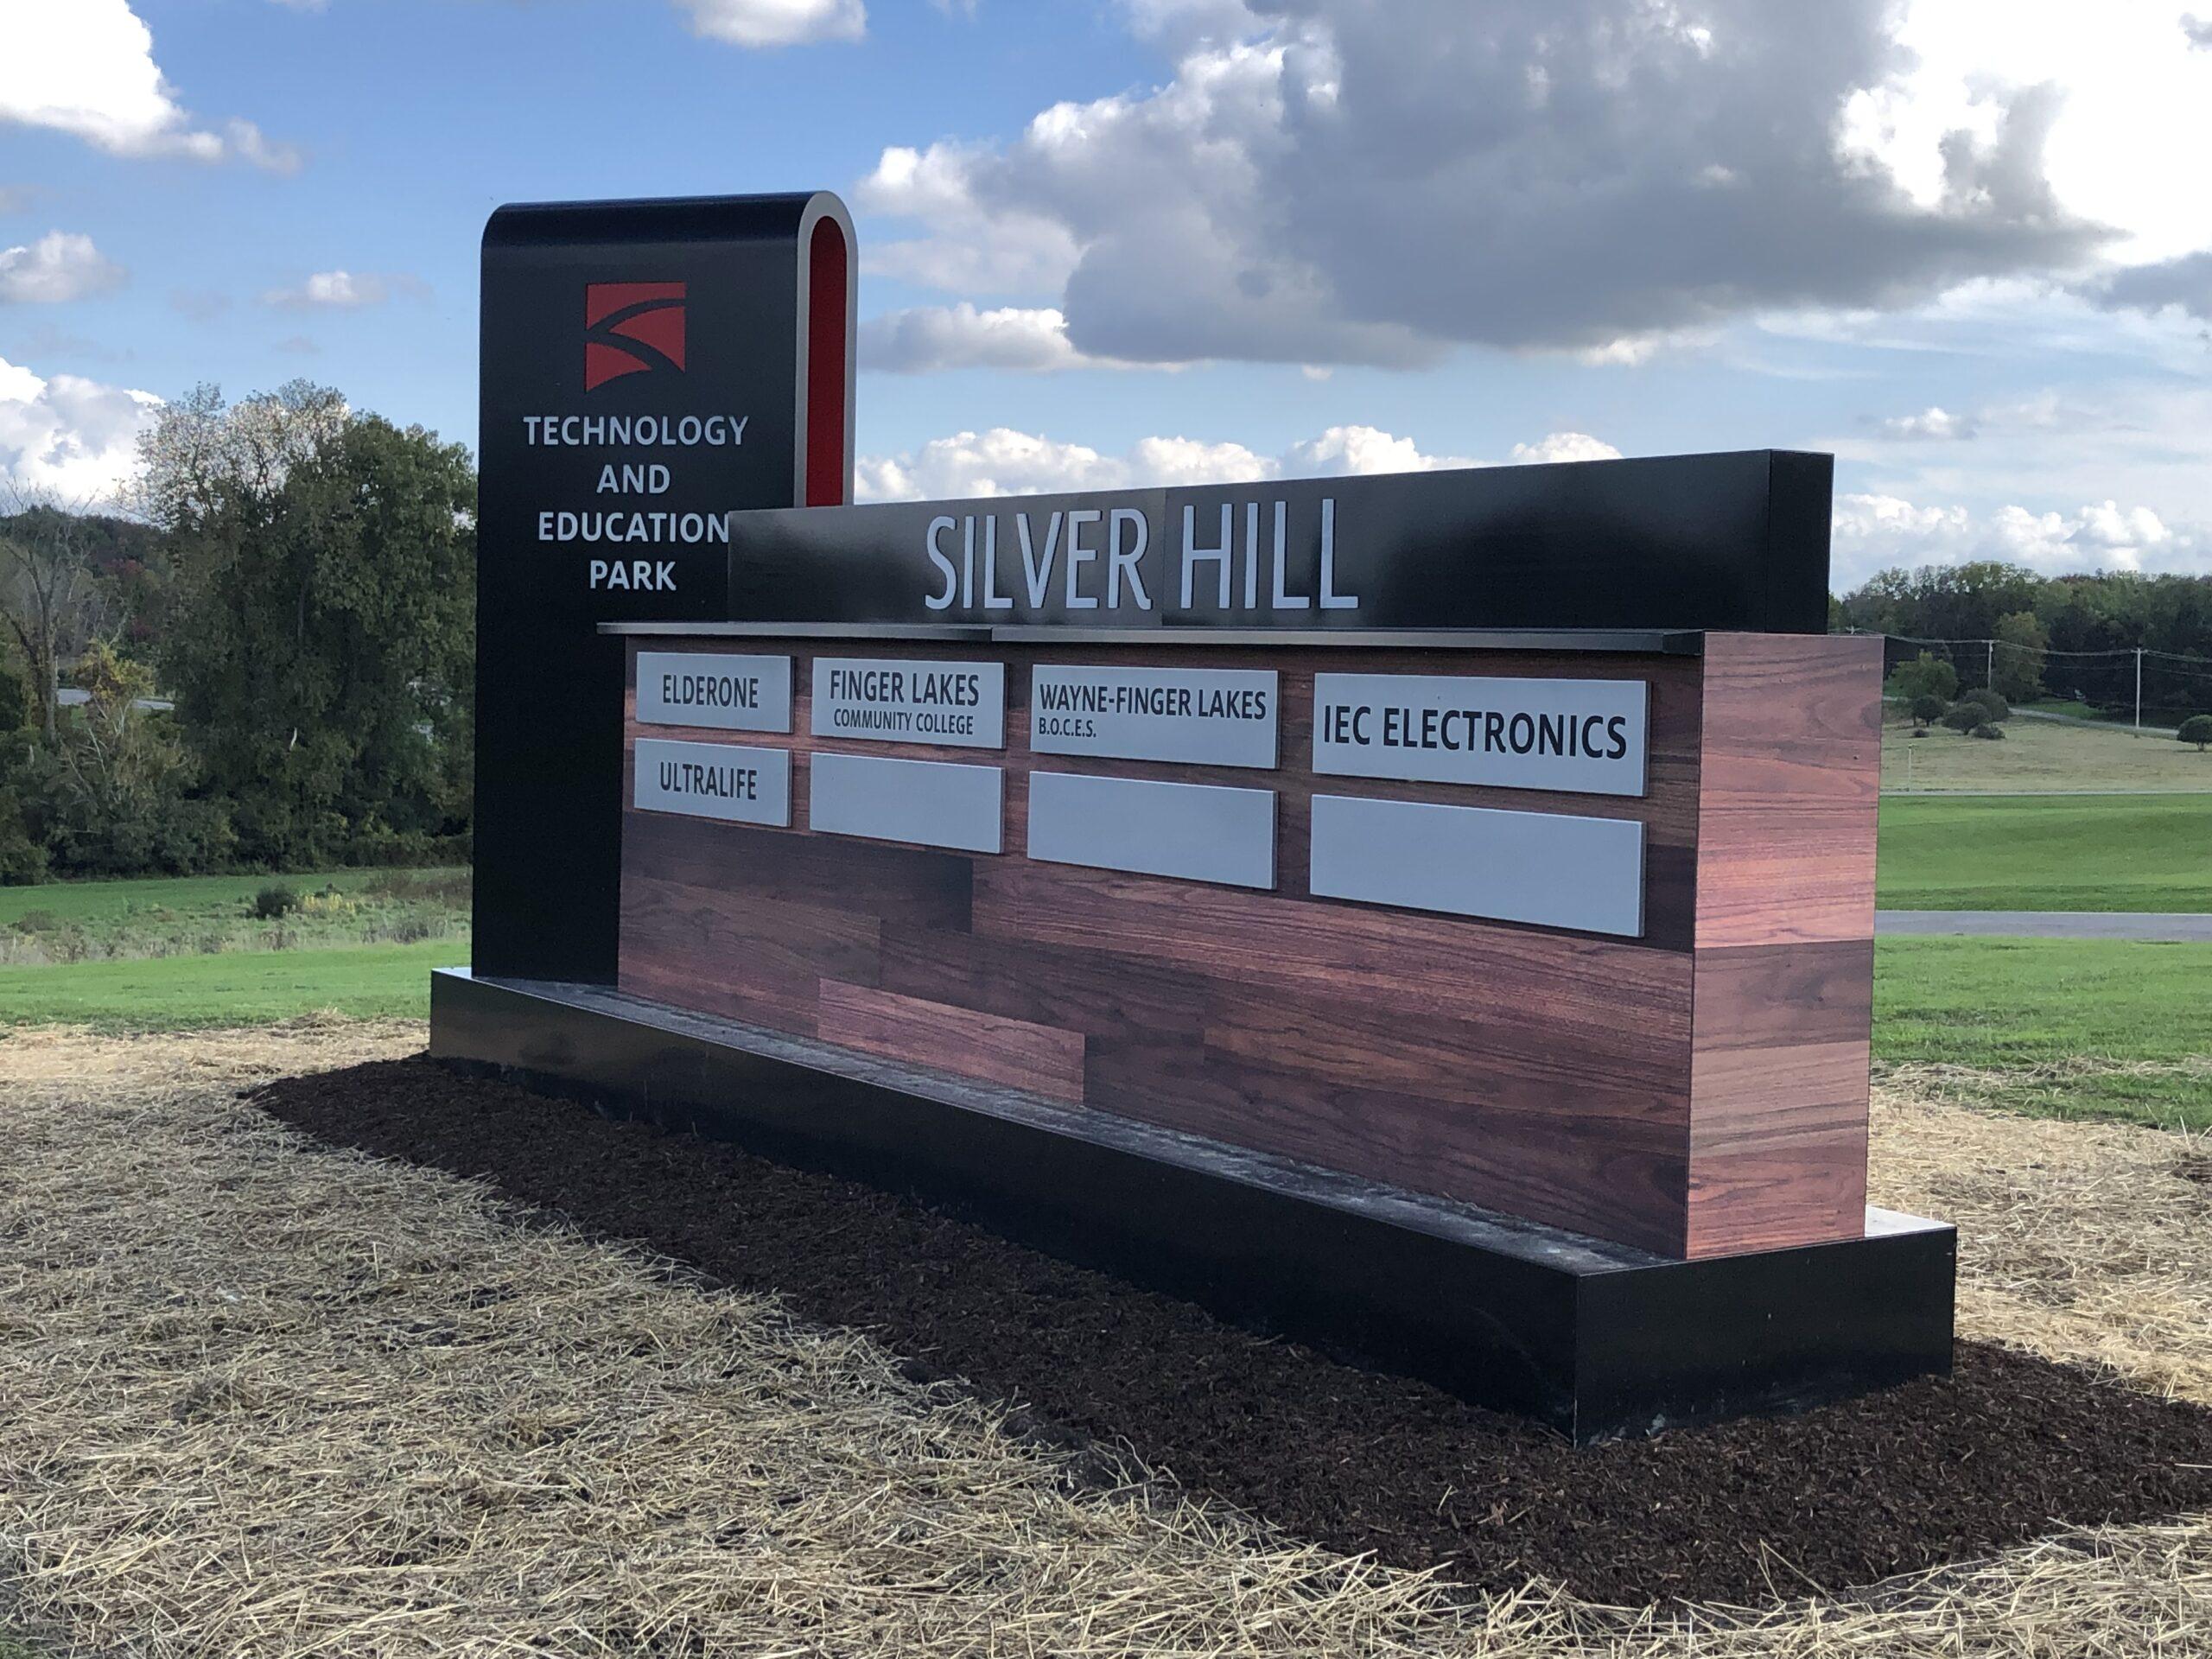 Silver Hill Technology Park